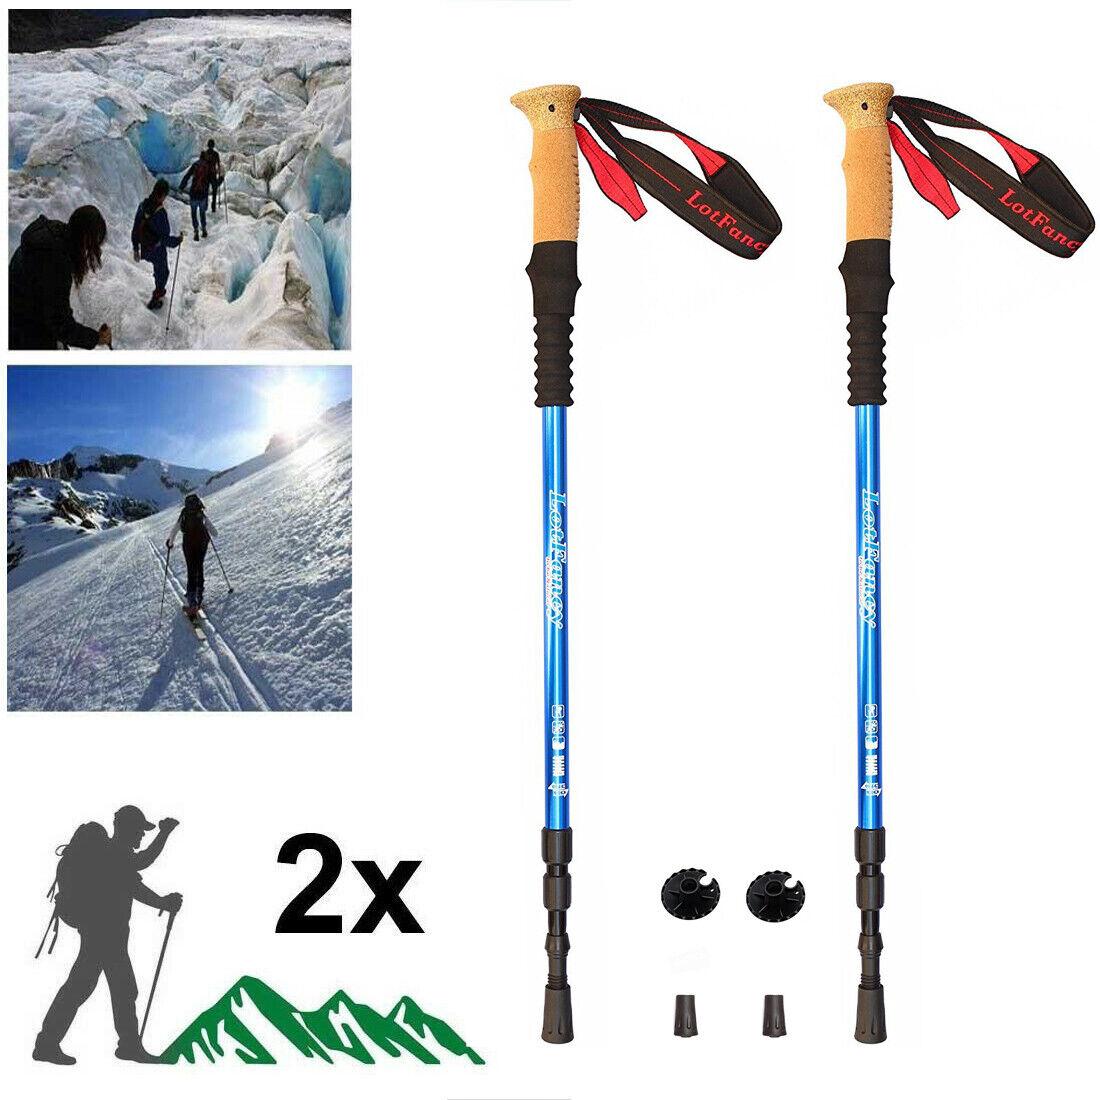 Pair 2 Alpenstock Trekking poles Aluminum 7075 Hiking poles